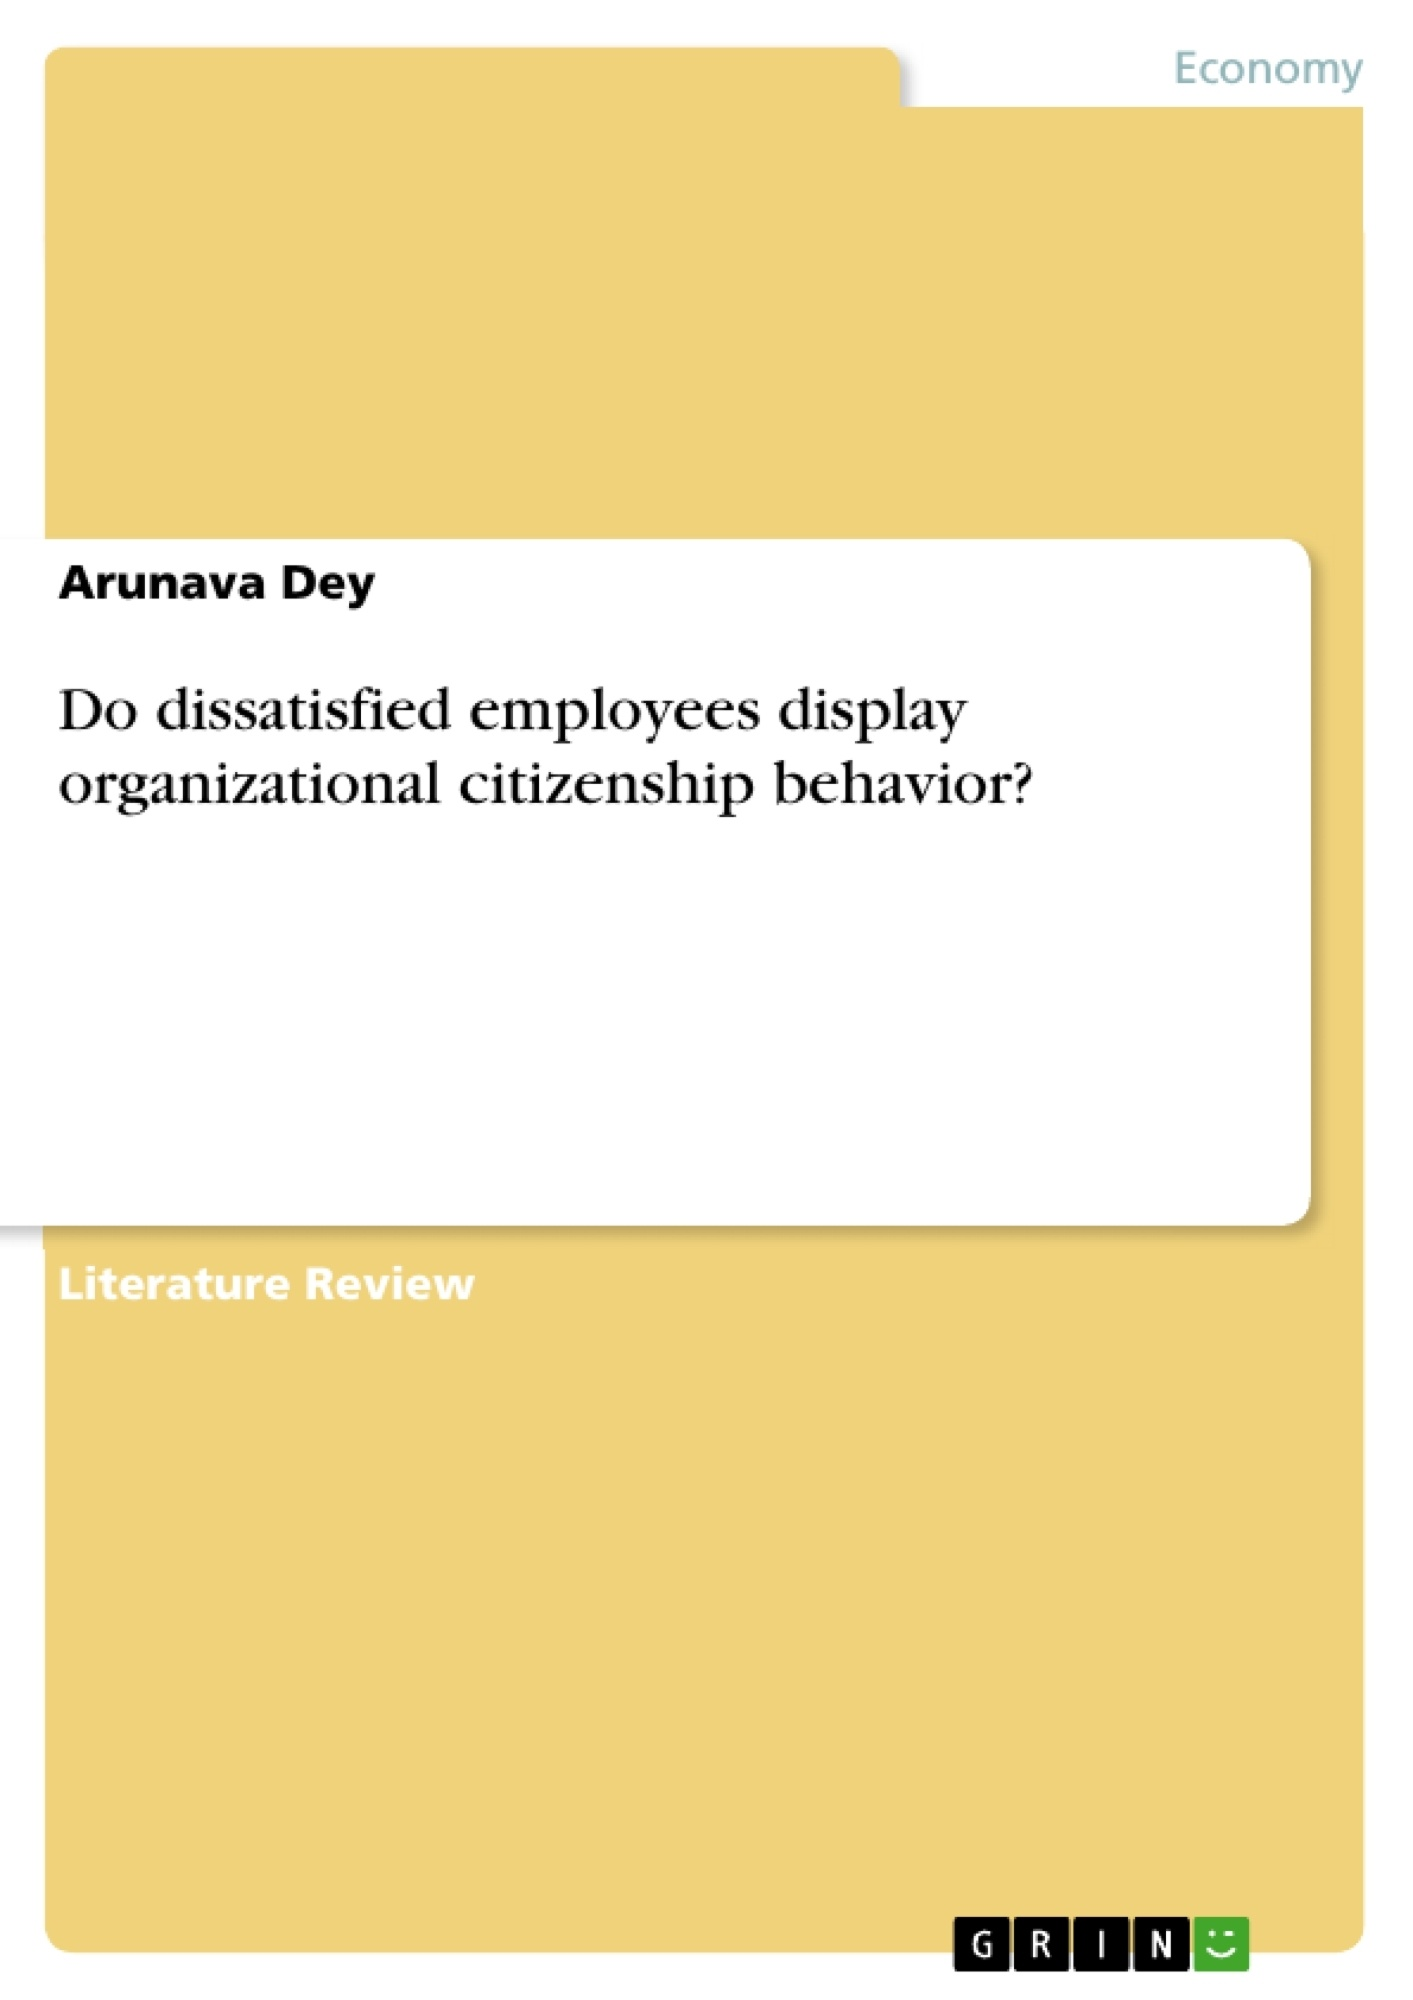 Title: Do dissatisfied employees display organizational citizenship behavior?